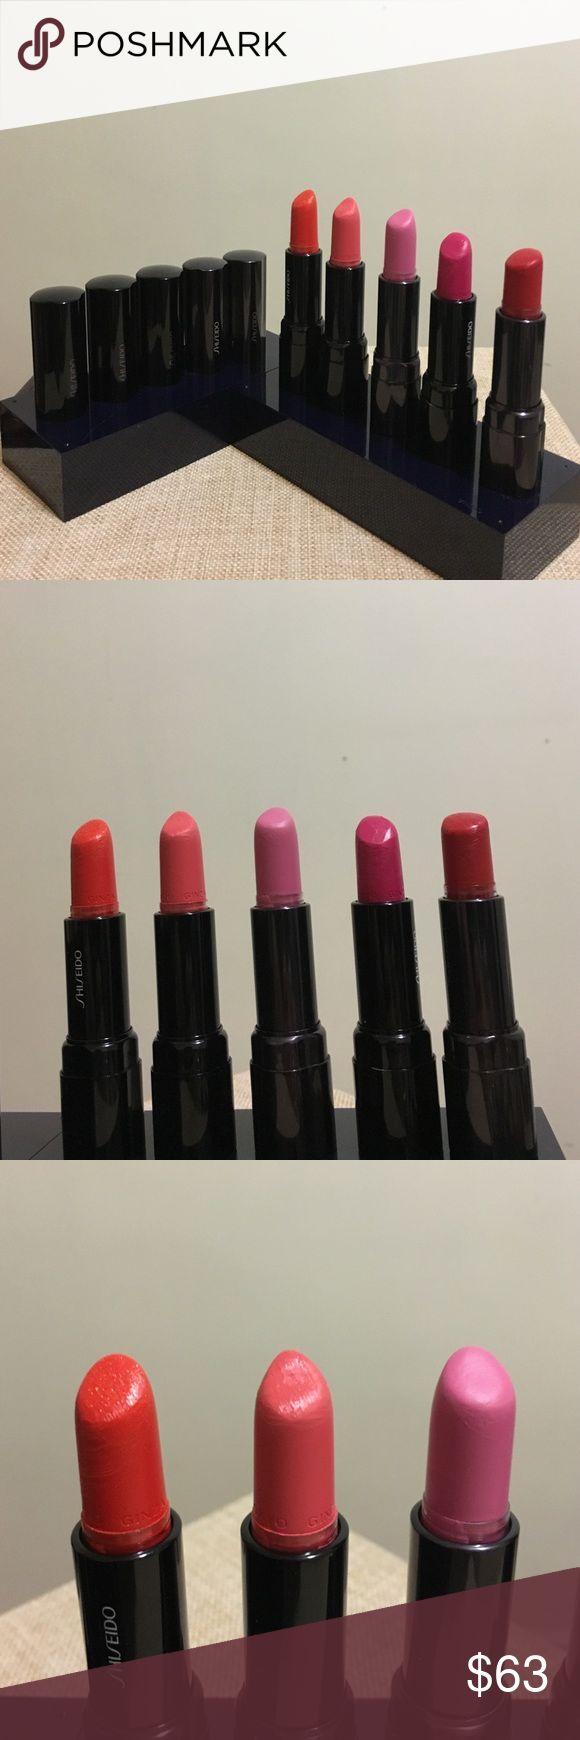 5 Shiseido lipsticks 5 Shiseido lipsticks. Used. Creamy. Love it's texture and pigment! SHISEIDO Makeup Lipstick